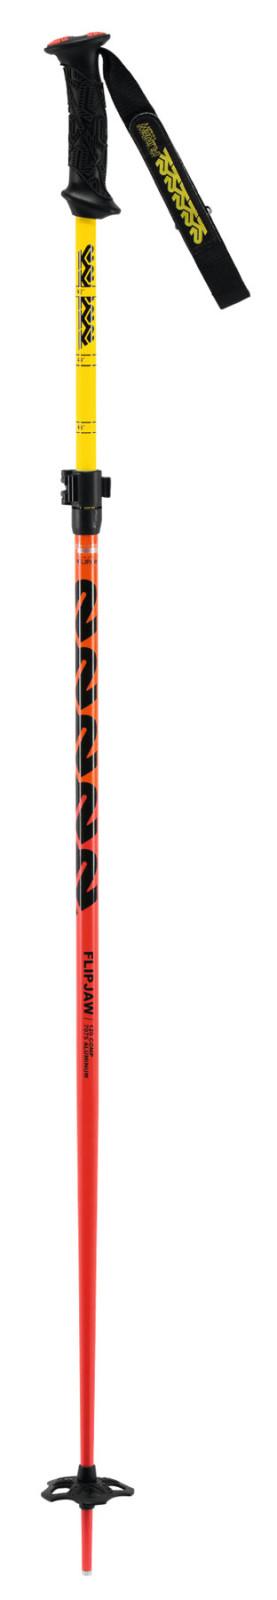 K2 FlipJaw 135 - oranžová